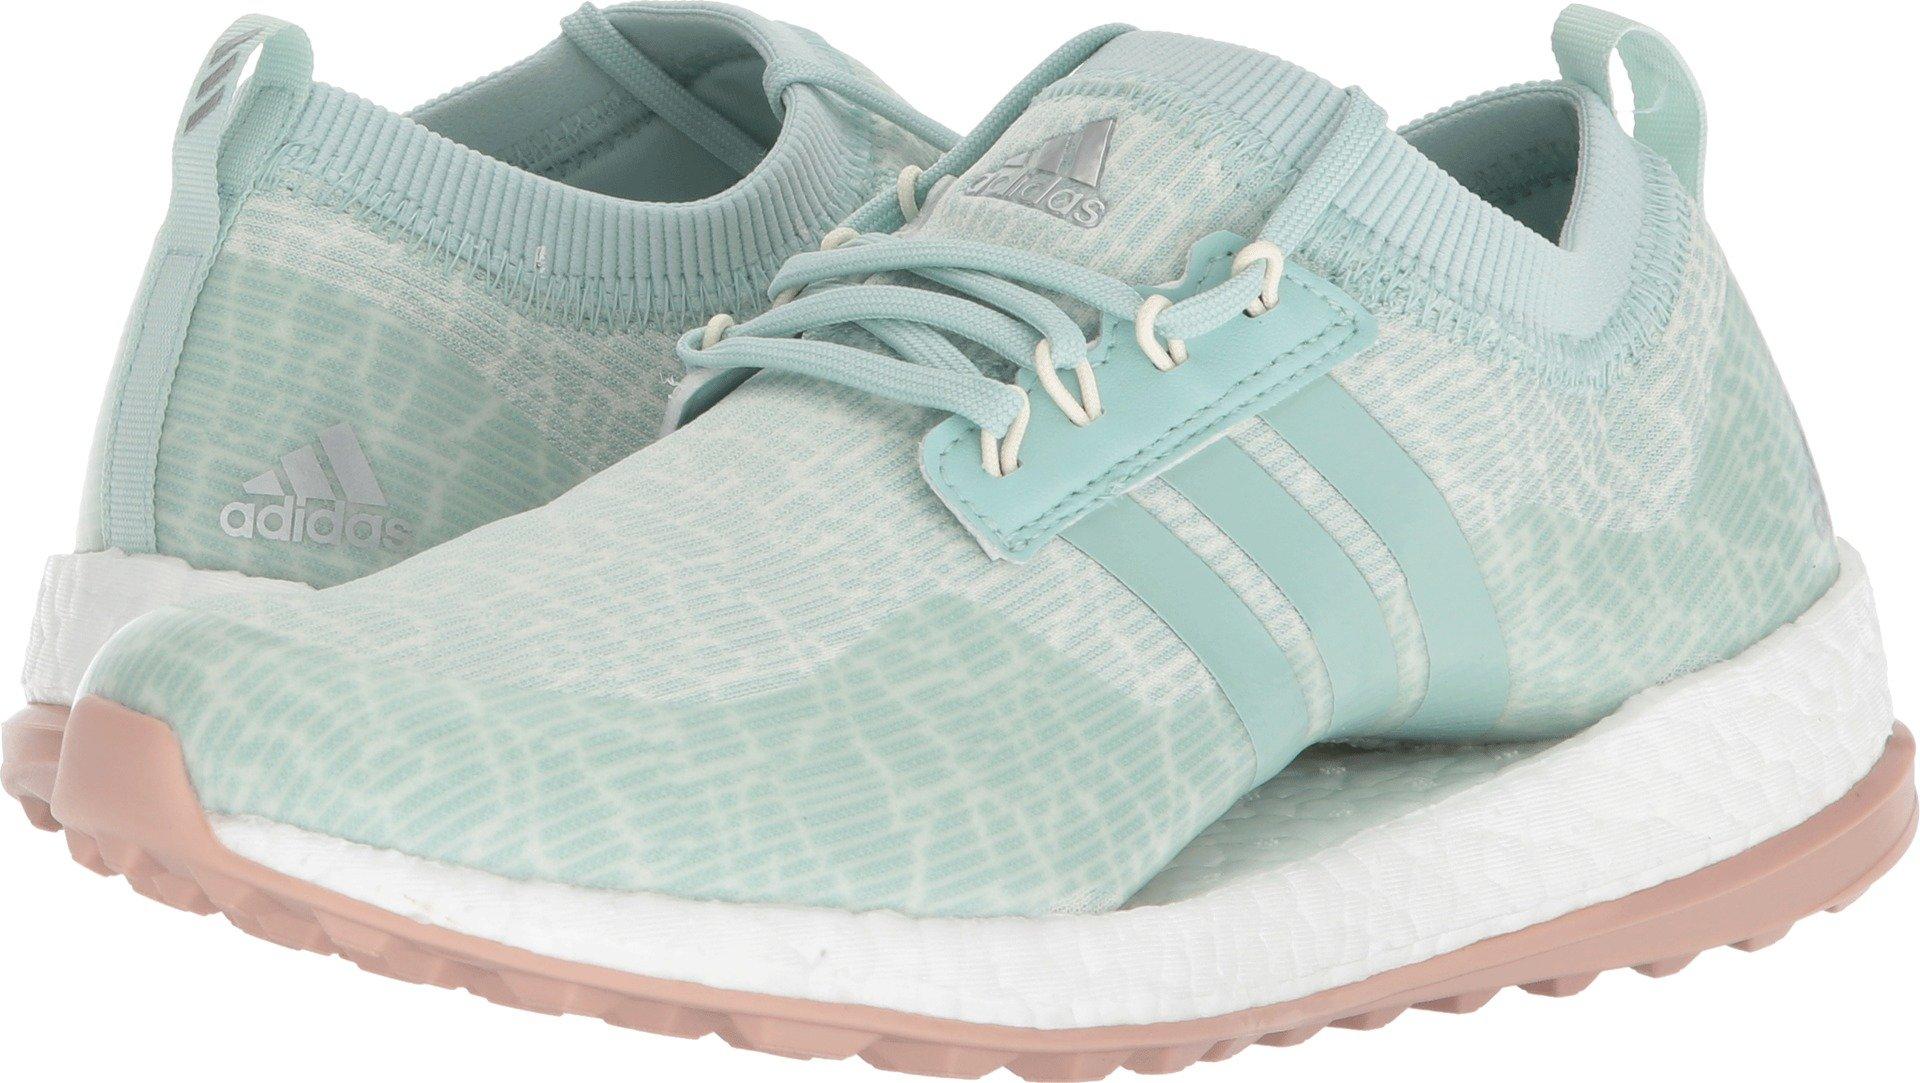 adidas Women's W Pure Boost Xg Golf Shoe, Ash Green/White Tint/Ash Pearl, 7 Medium US by adidas (Image #1)